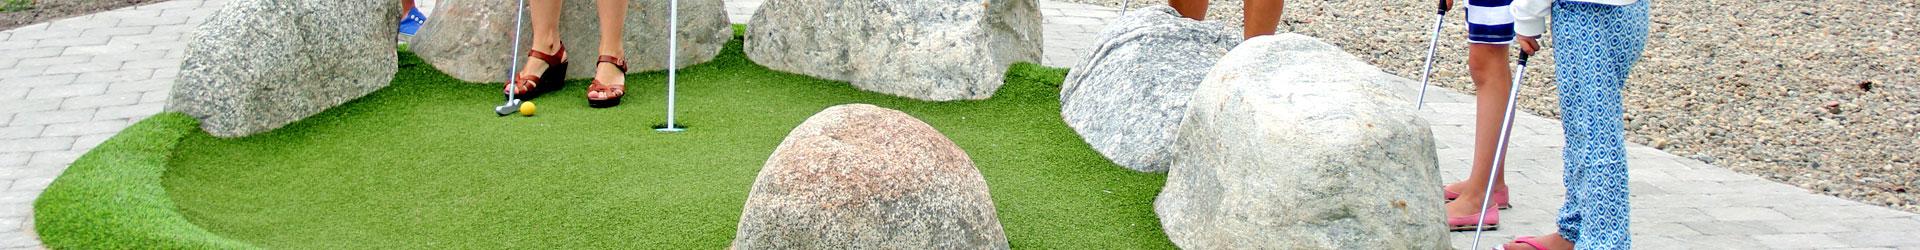 Projet de création de terrain de Minigolf